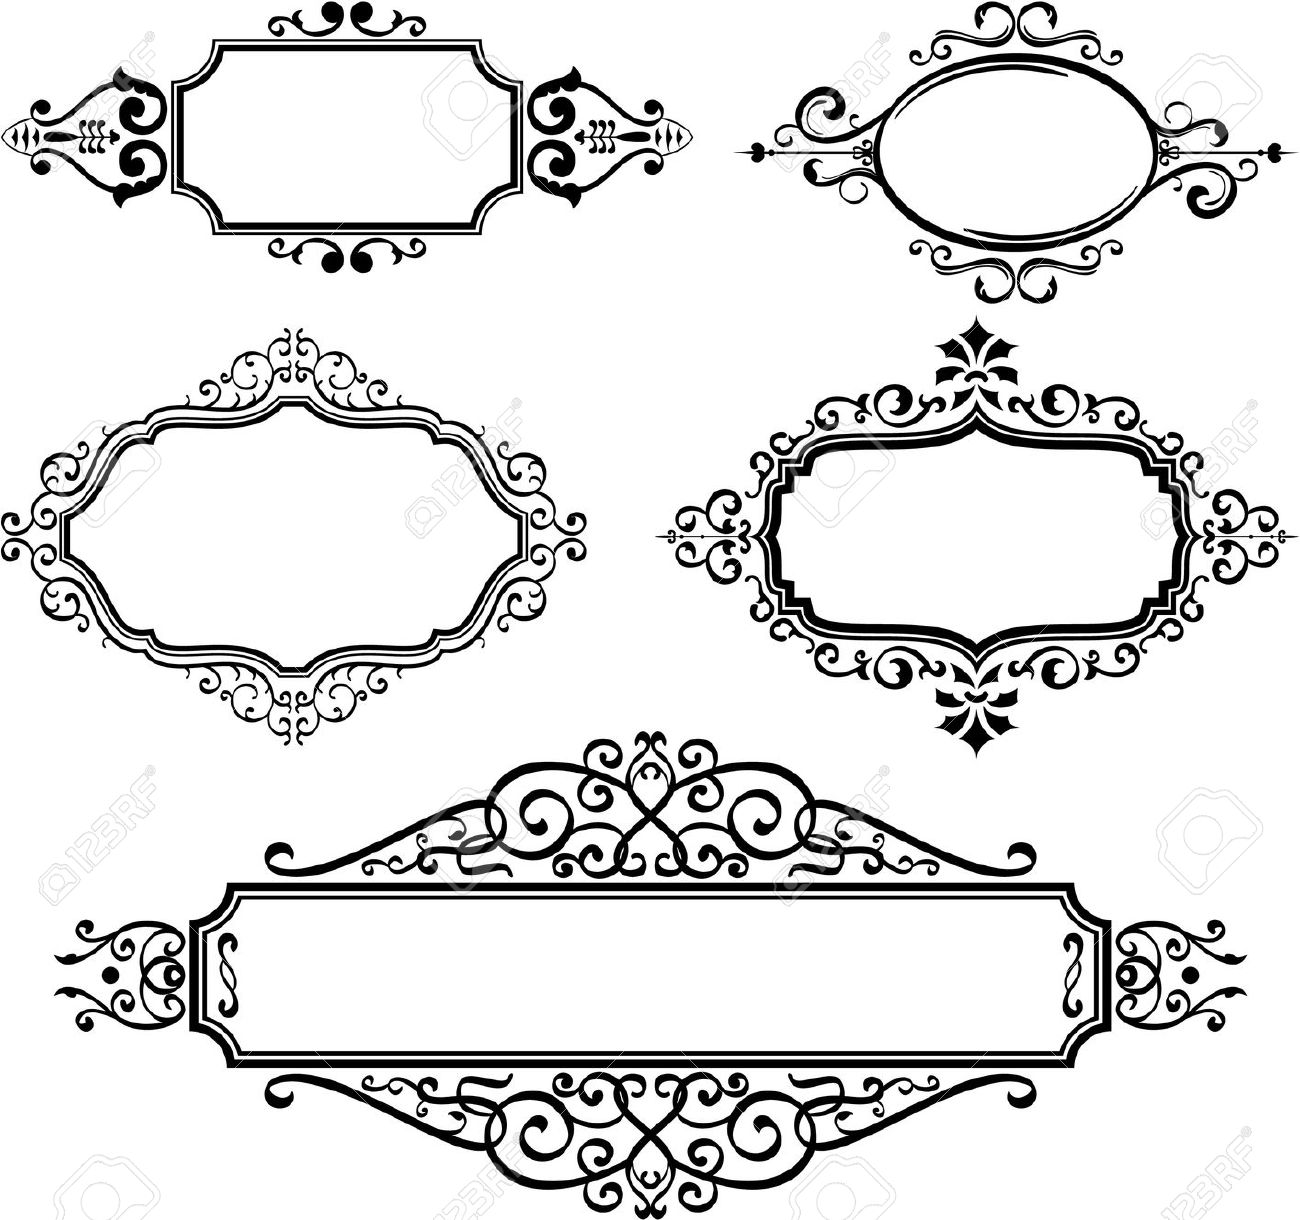 1300x1220 Scrolls Clipart Ornate ~ Frames ~ Illustrations ~ Hd Images